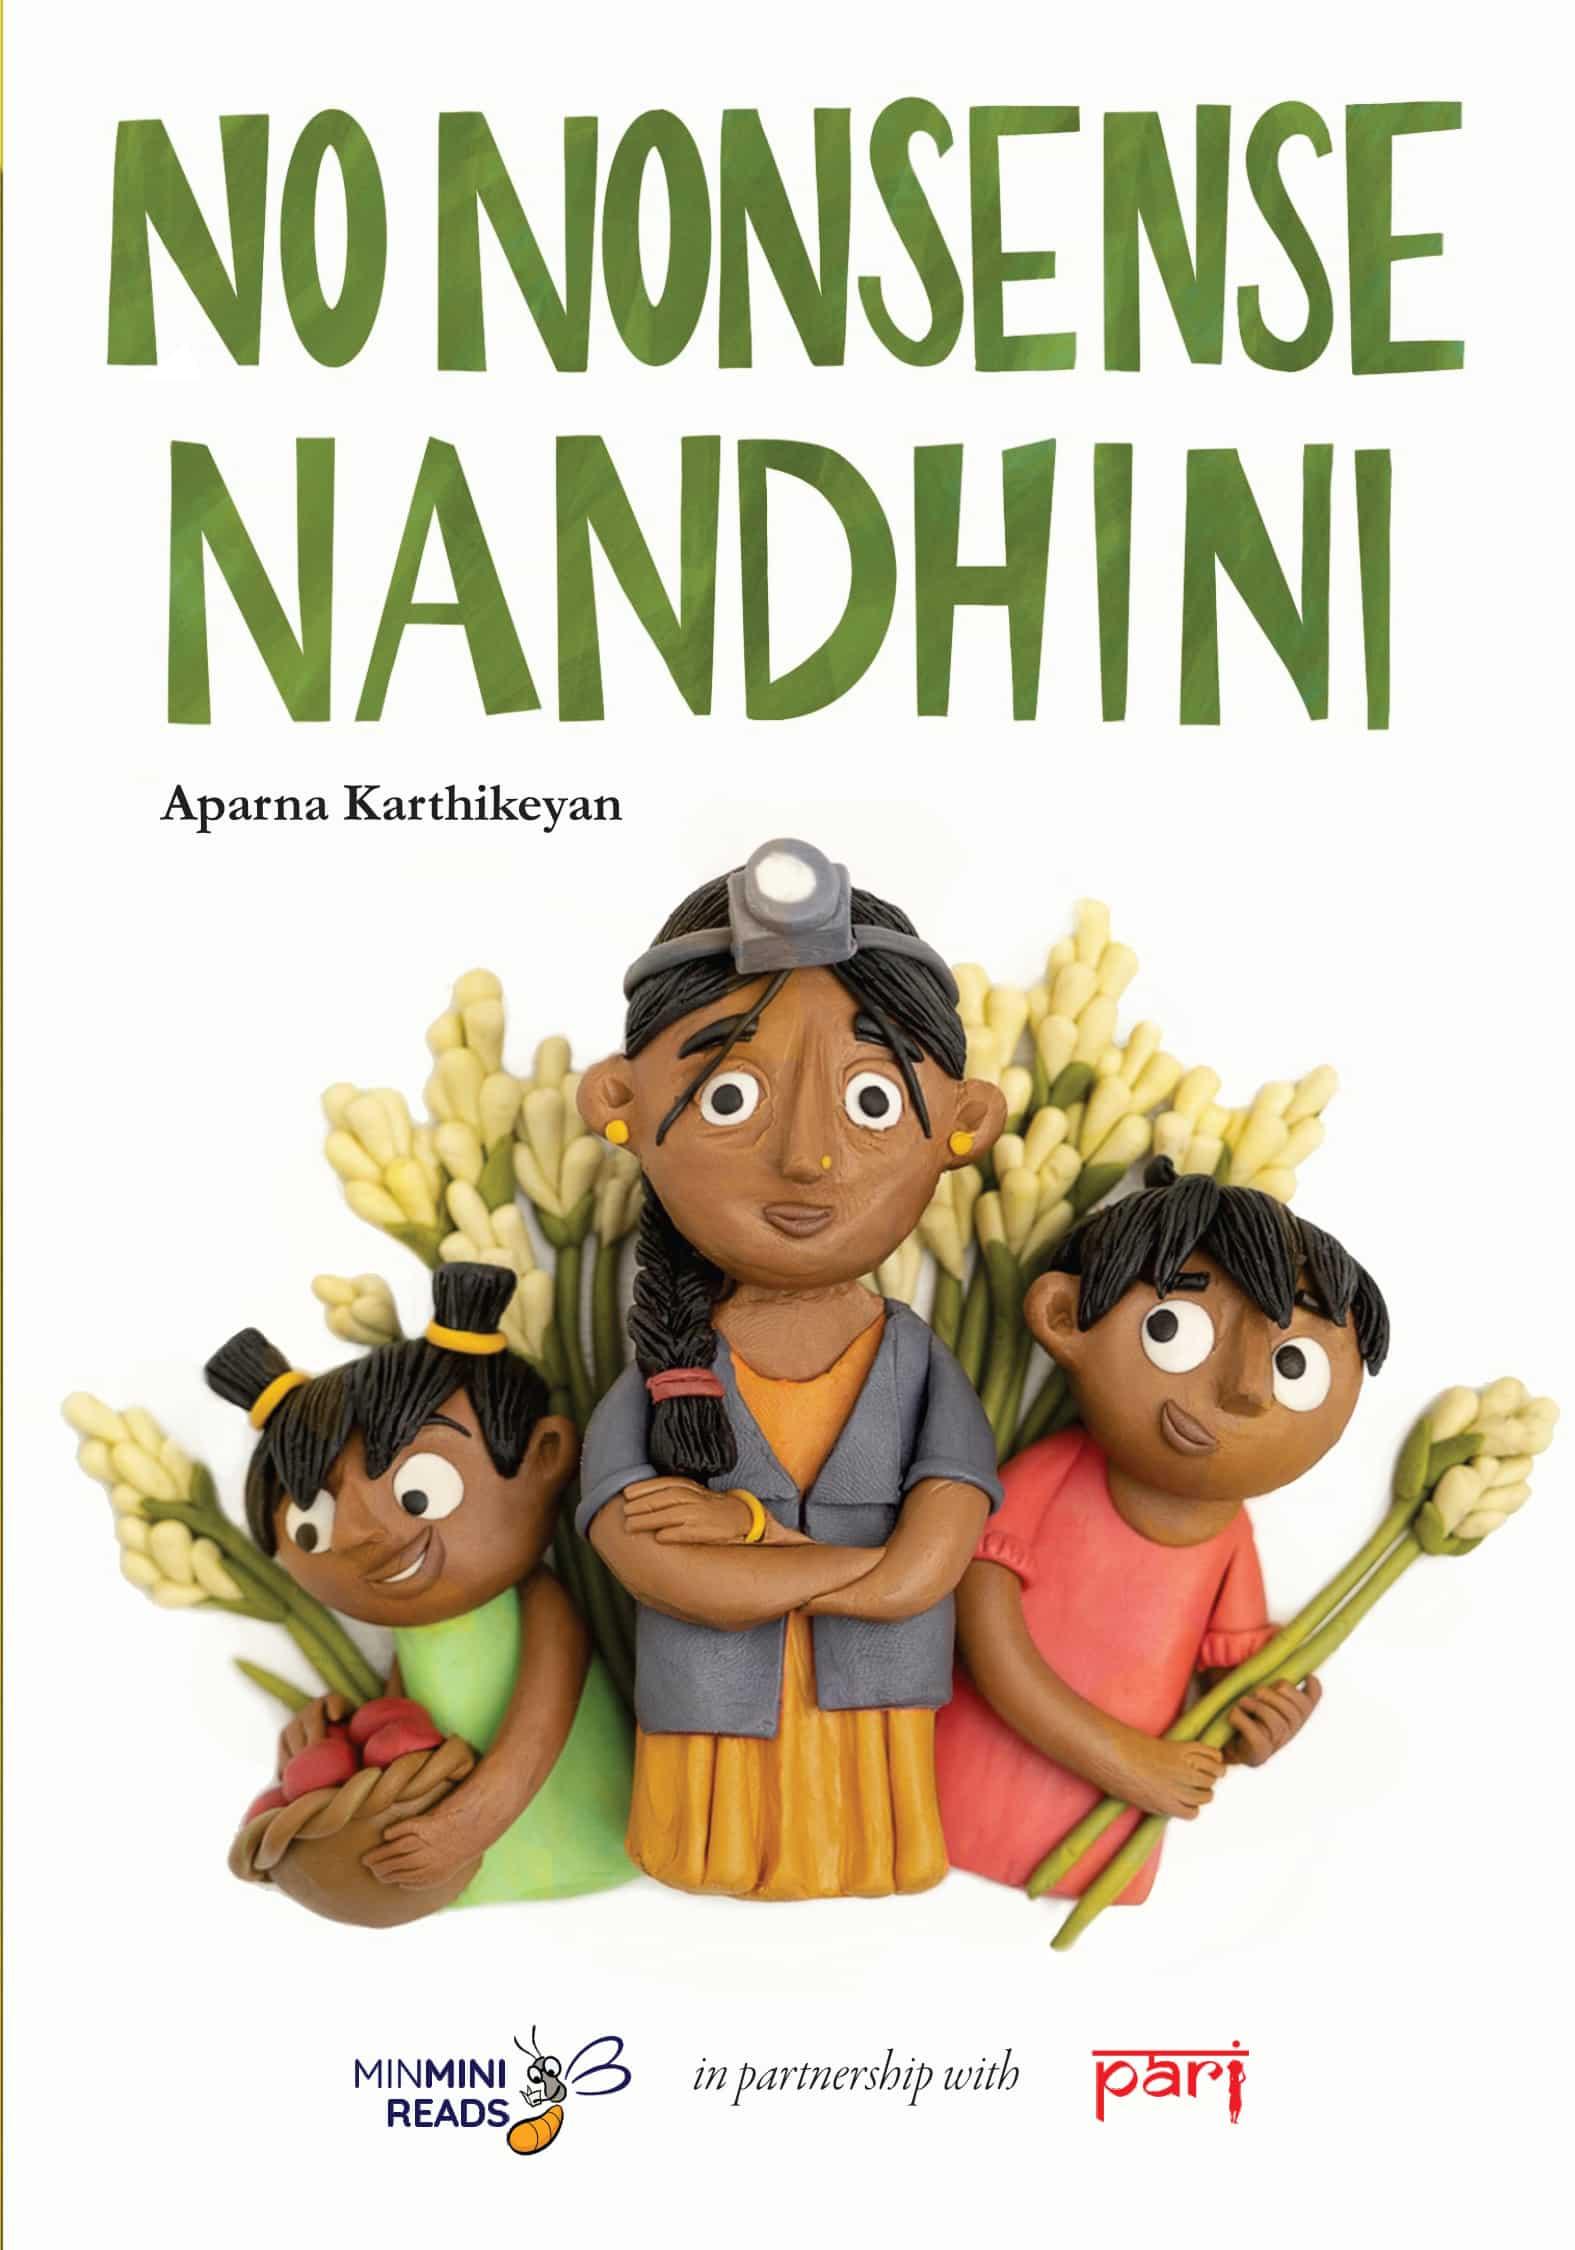 No Nonsense Nandhini by Aparna Karthikeyan